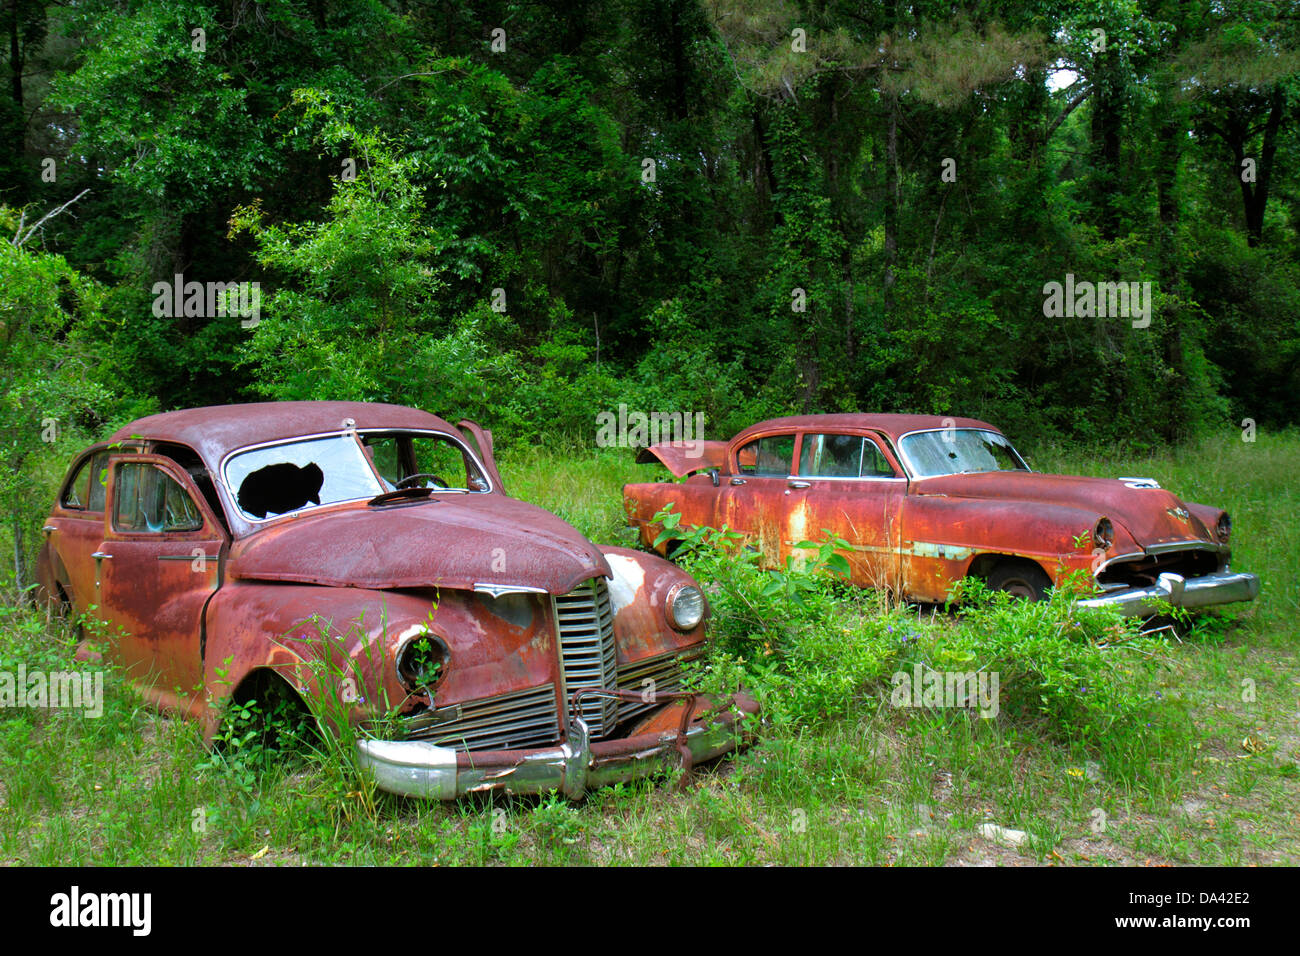 Florida Trinidad antike Autos automobile Fahrzeuge verrostet Stockfoto